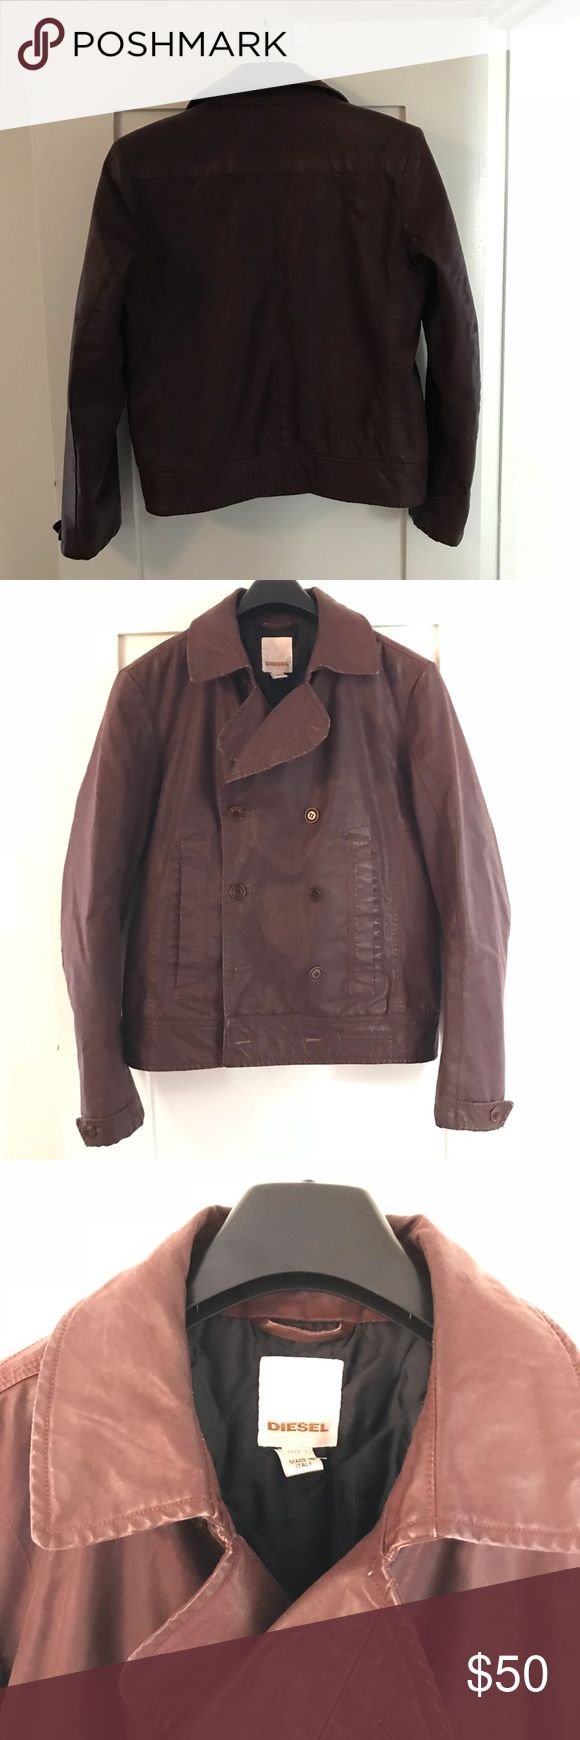 Diesel men's jacket L Waxed Cotton men's diesel jacket / pea coat . Brown, size L. Made in Italy!! - - Make an offer! Diesel Jackets & Coats Pea Coats